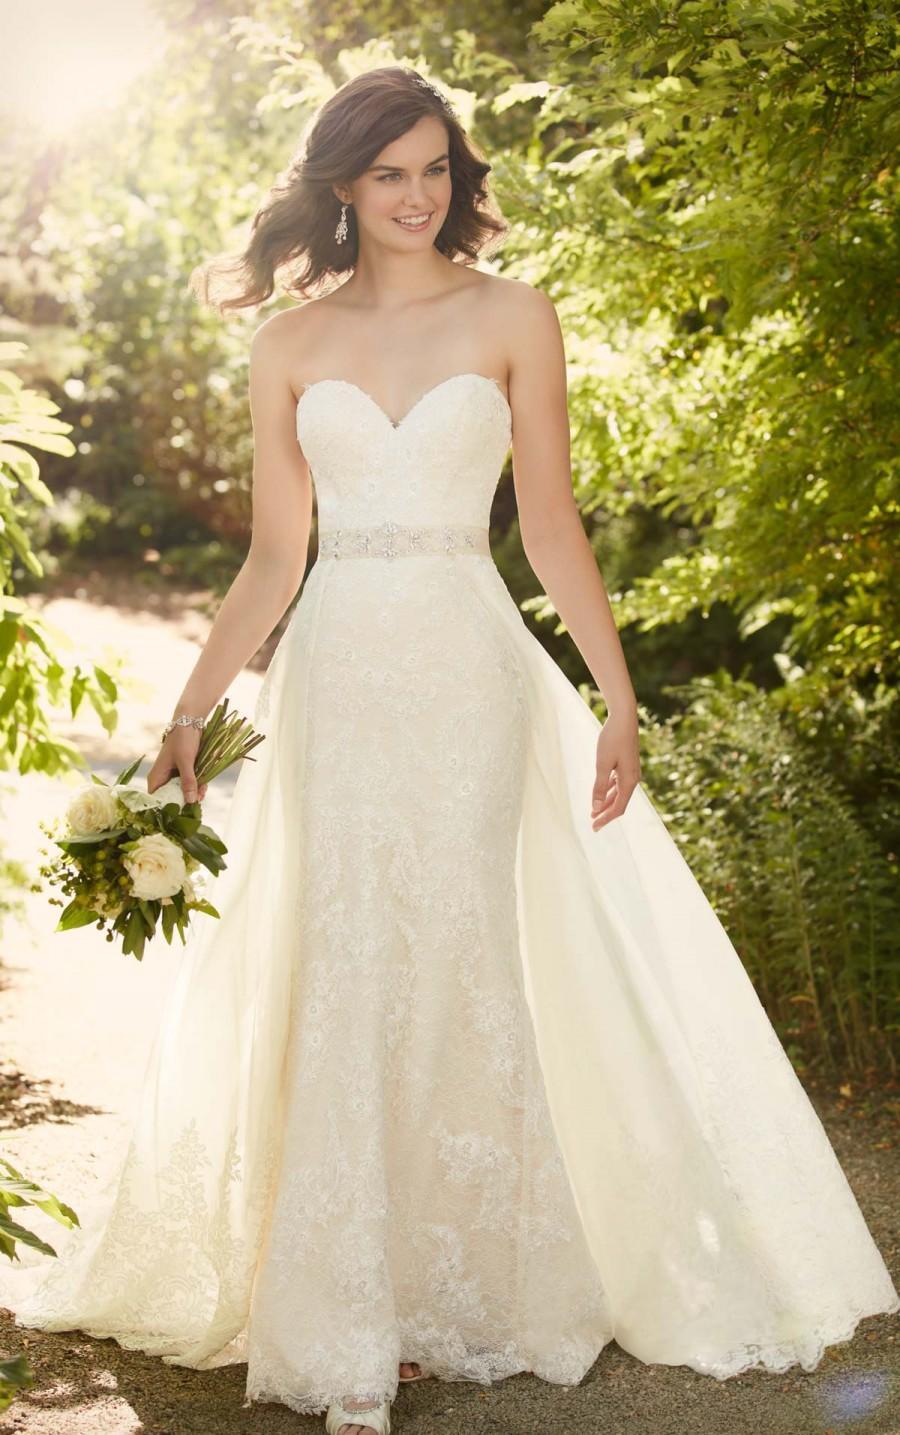 Essense Of Australia Wedding Dress Style D2039 #2432681 - Weddbook